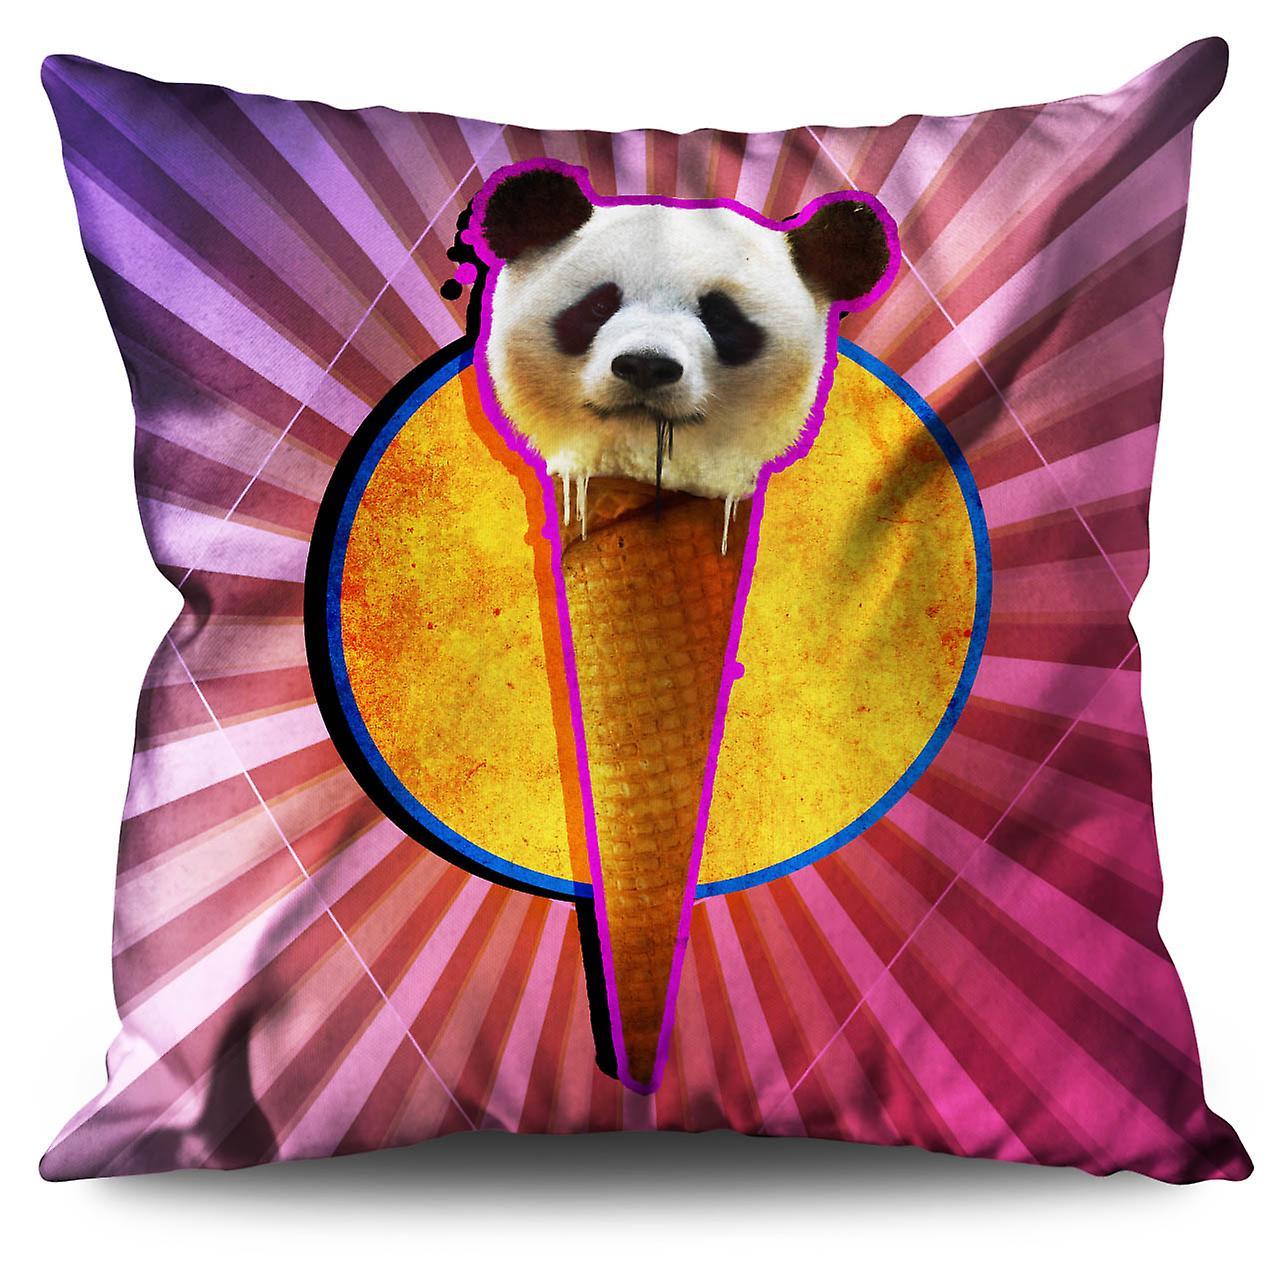 Cônes Espace CmWellcoda Panda X 30 Coussin De stQrhdC